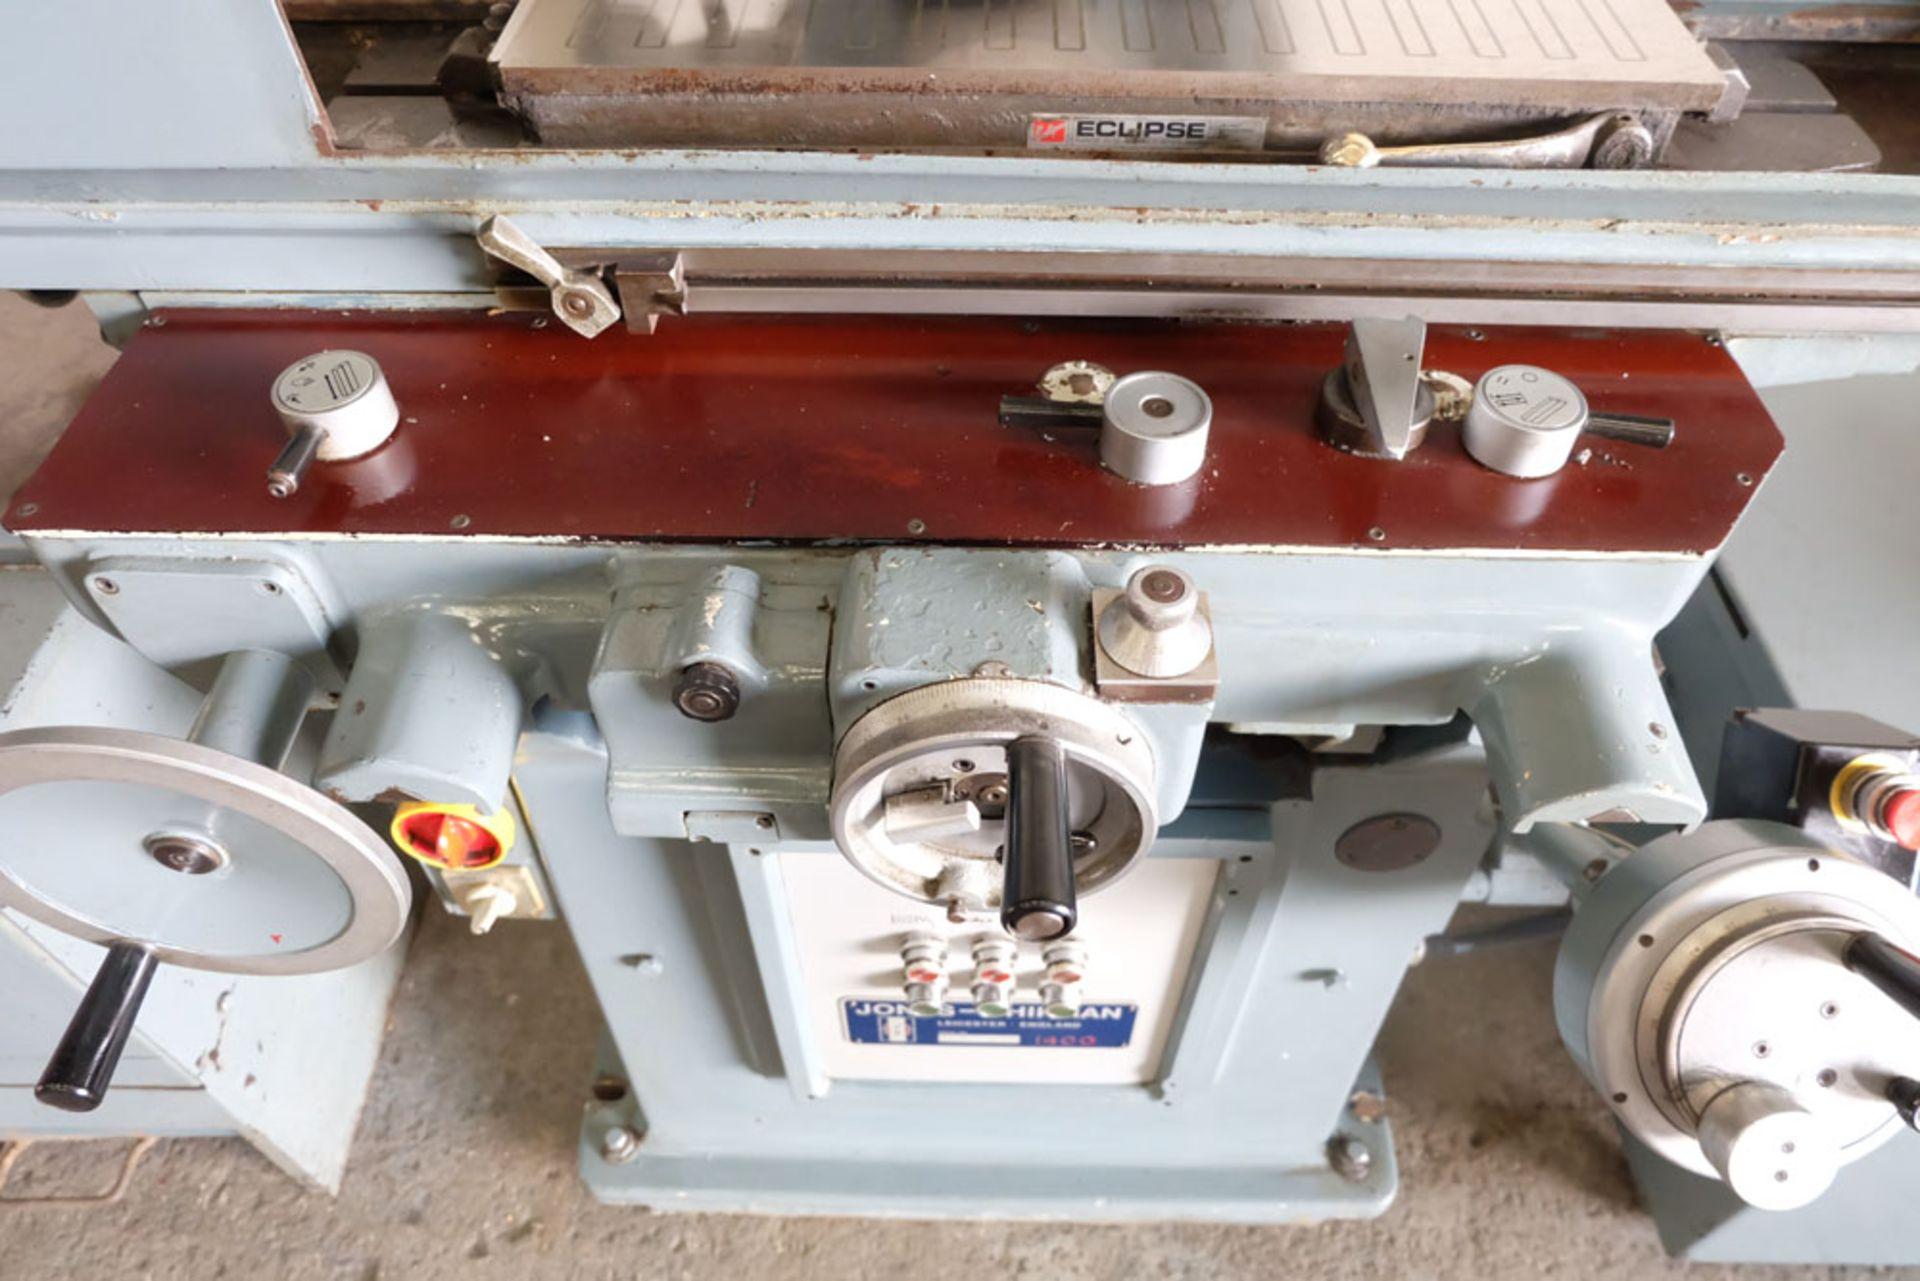 Jones & Shipman 1400P Toolroom Surface Grinder. - Image 8 of 13